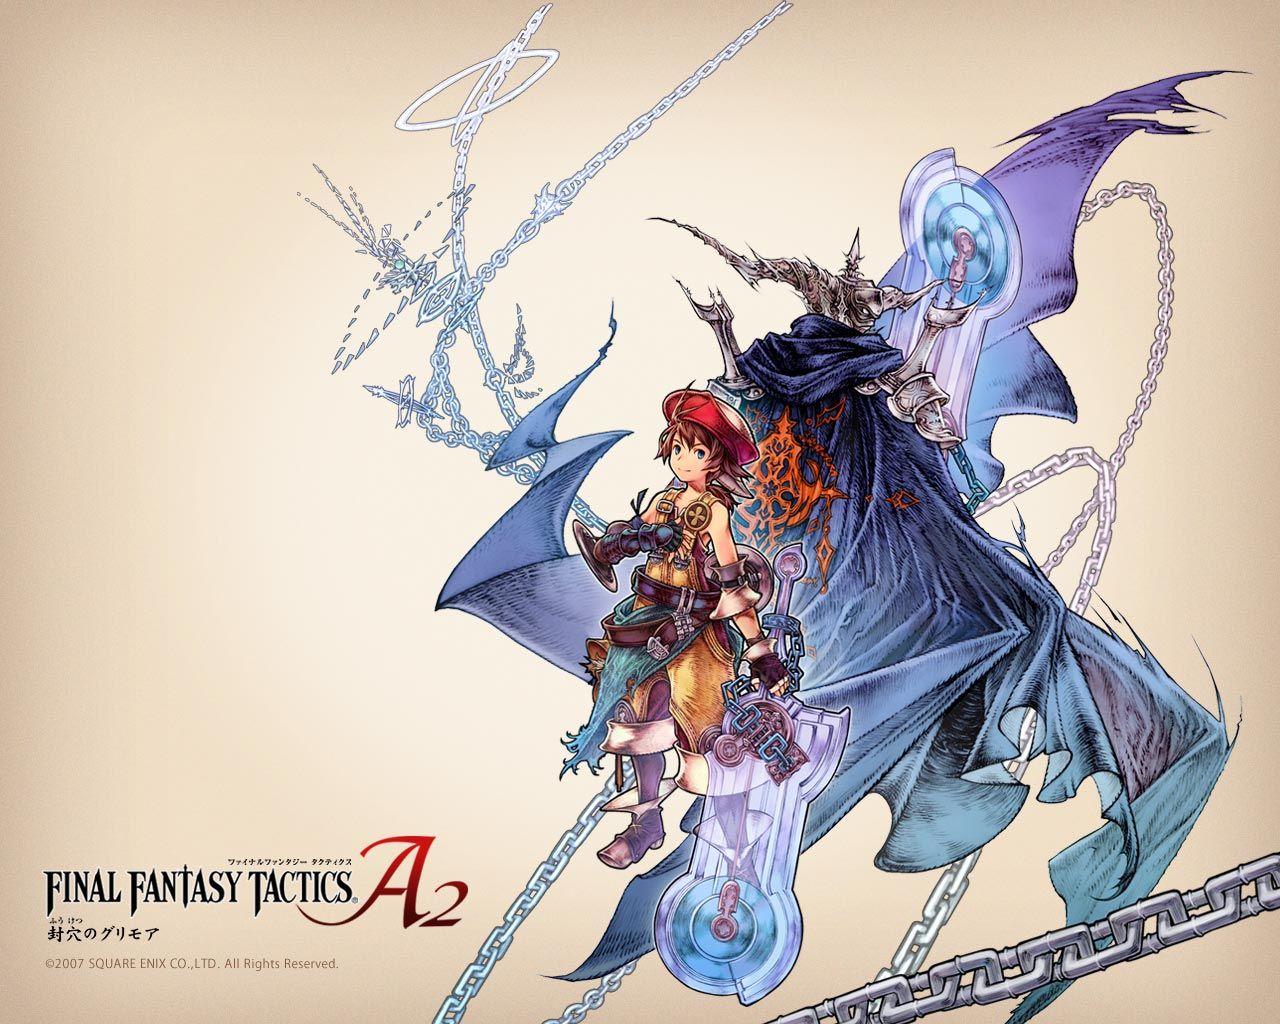 Final Fantasy Tactics A2 Wallpaper 1 With Images Final